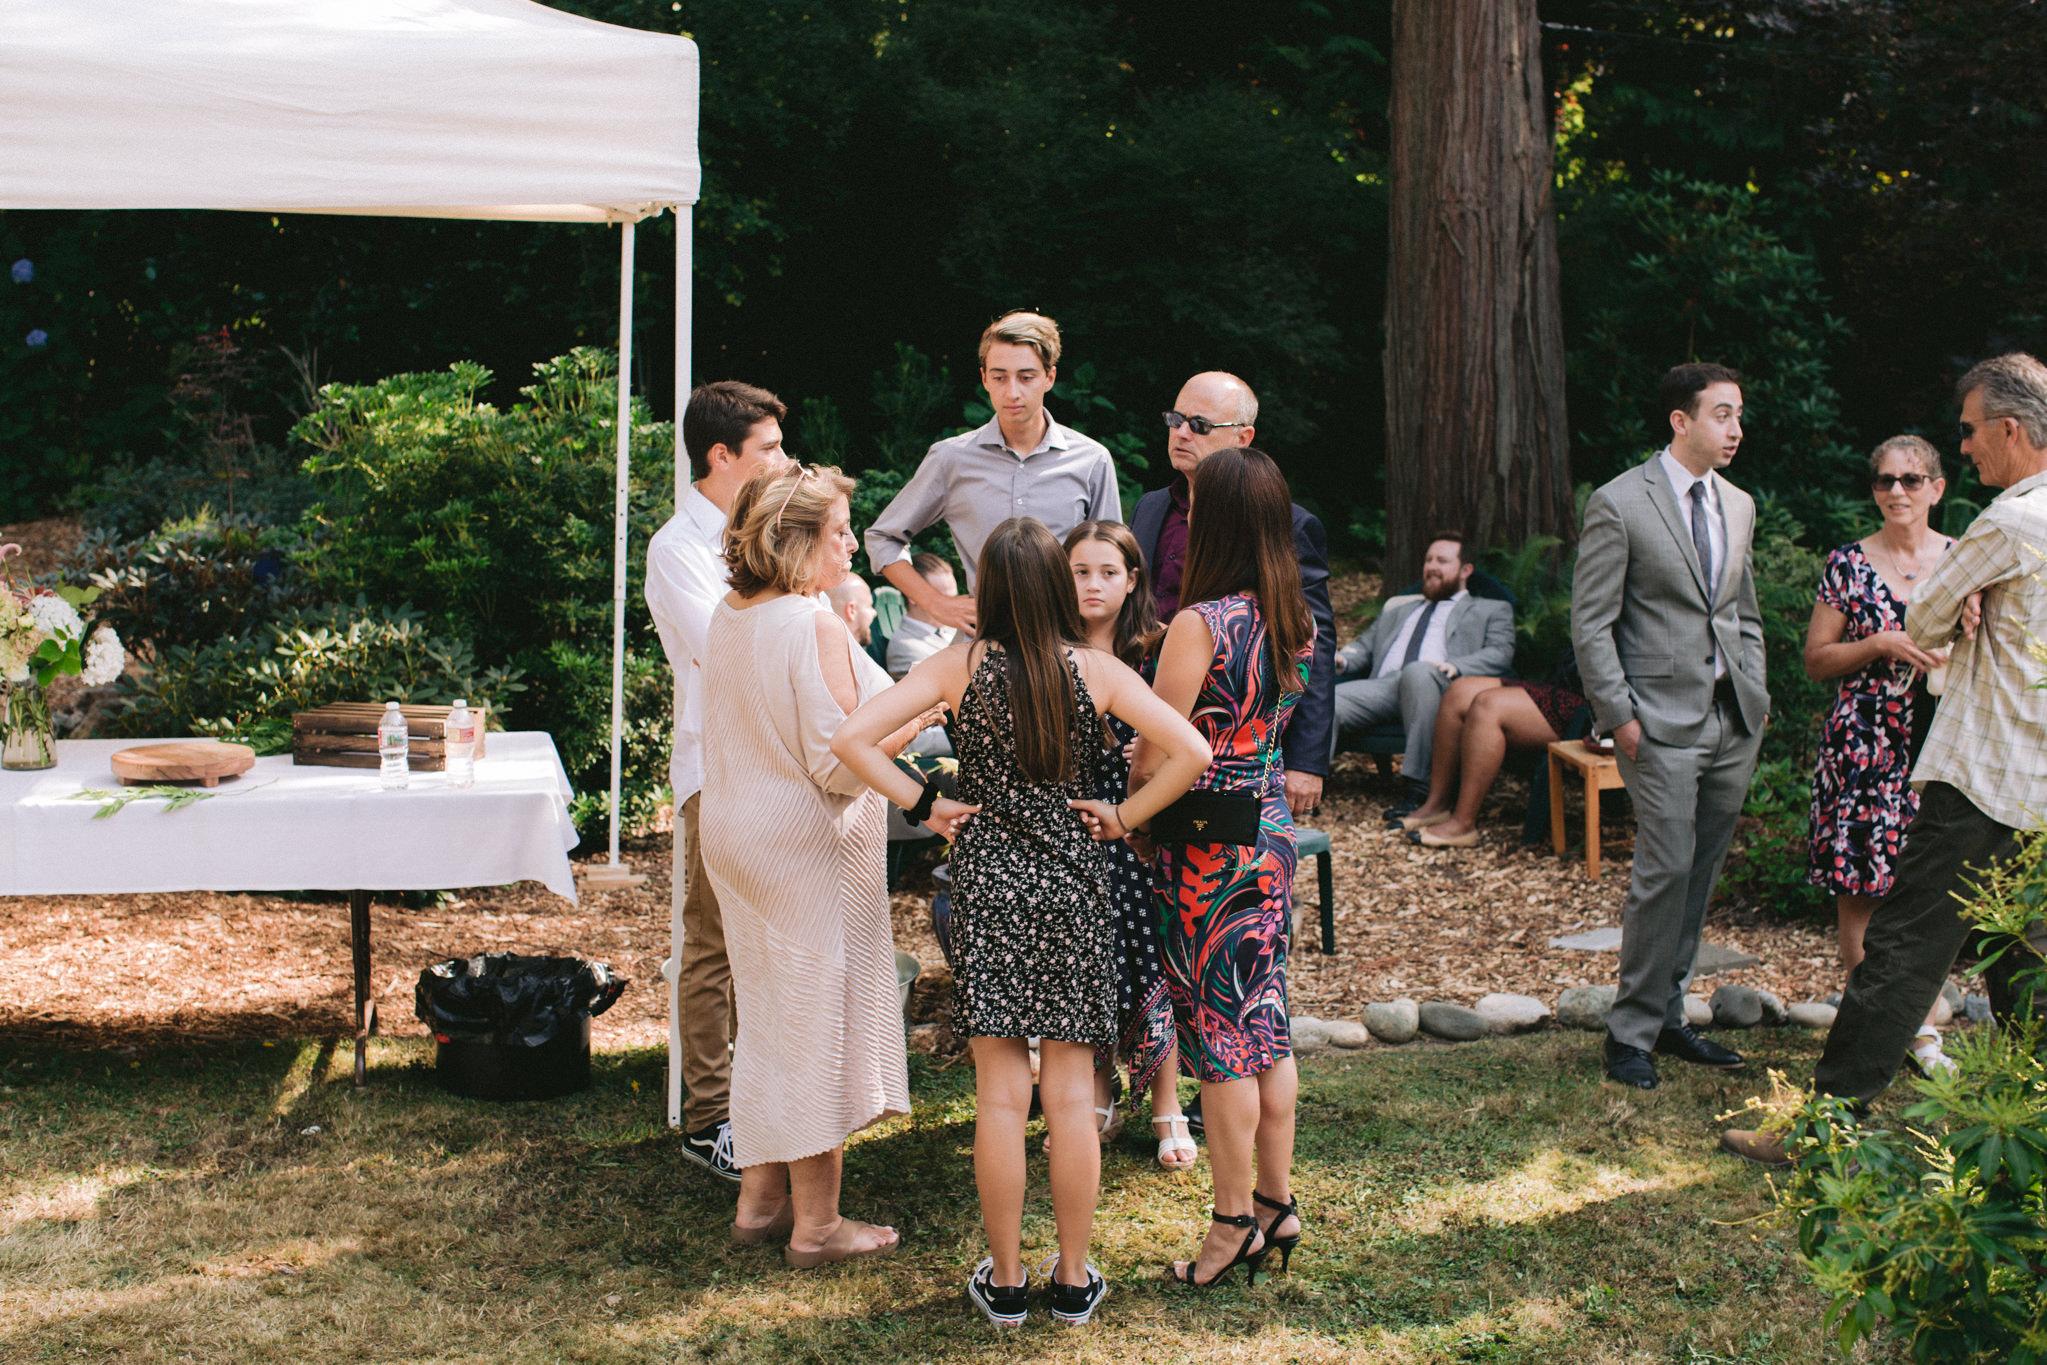 Backyard-Bainbridge-Island-Wedding-Alycia-Lovell-Photography-63.JPG